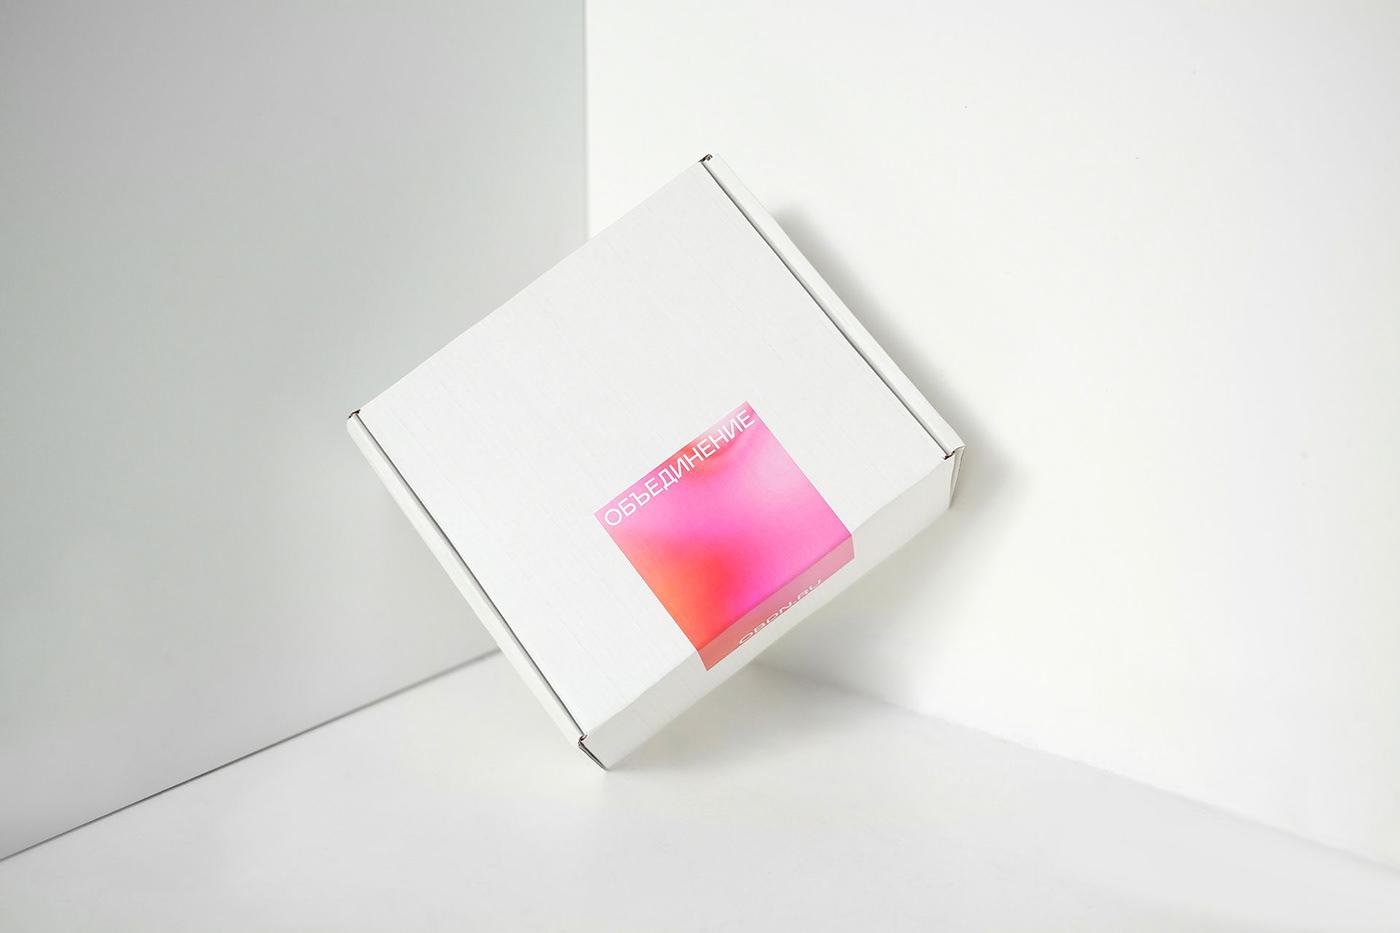 box packaging Merch modern art Photography  souvenirs gift box scarf